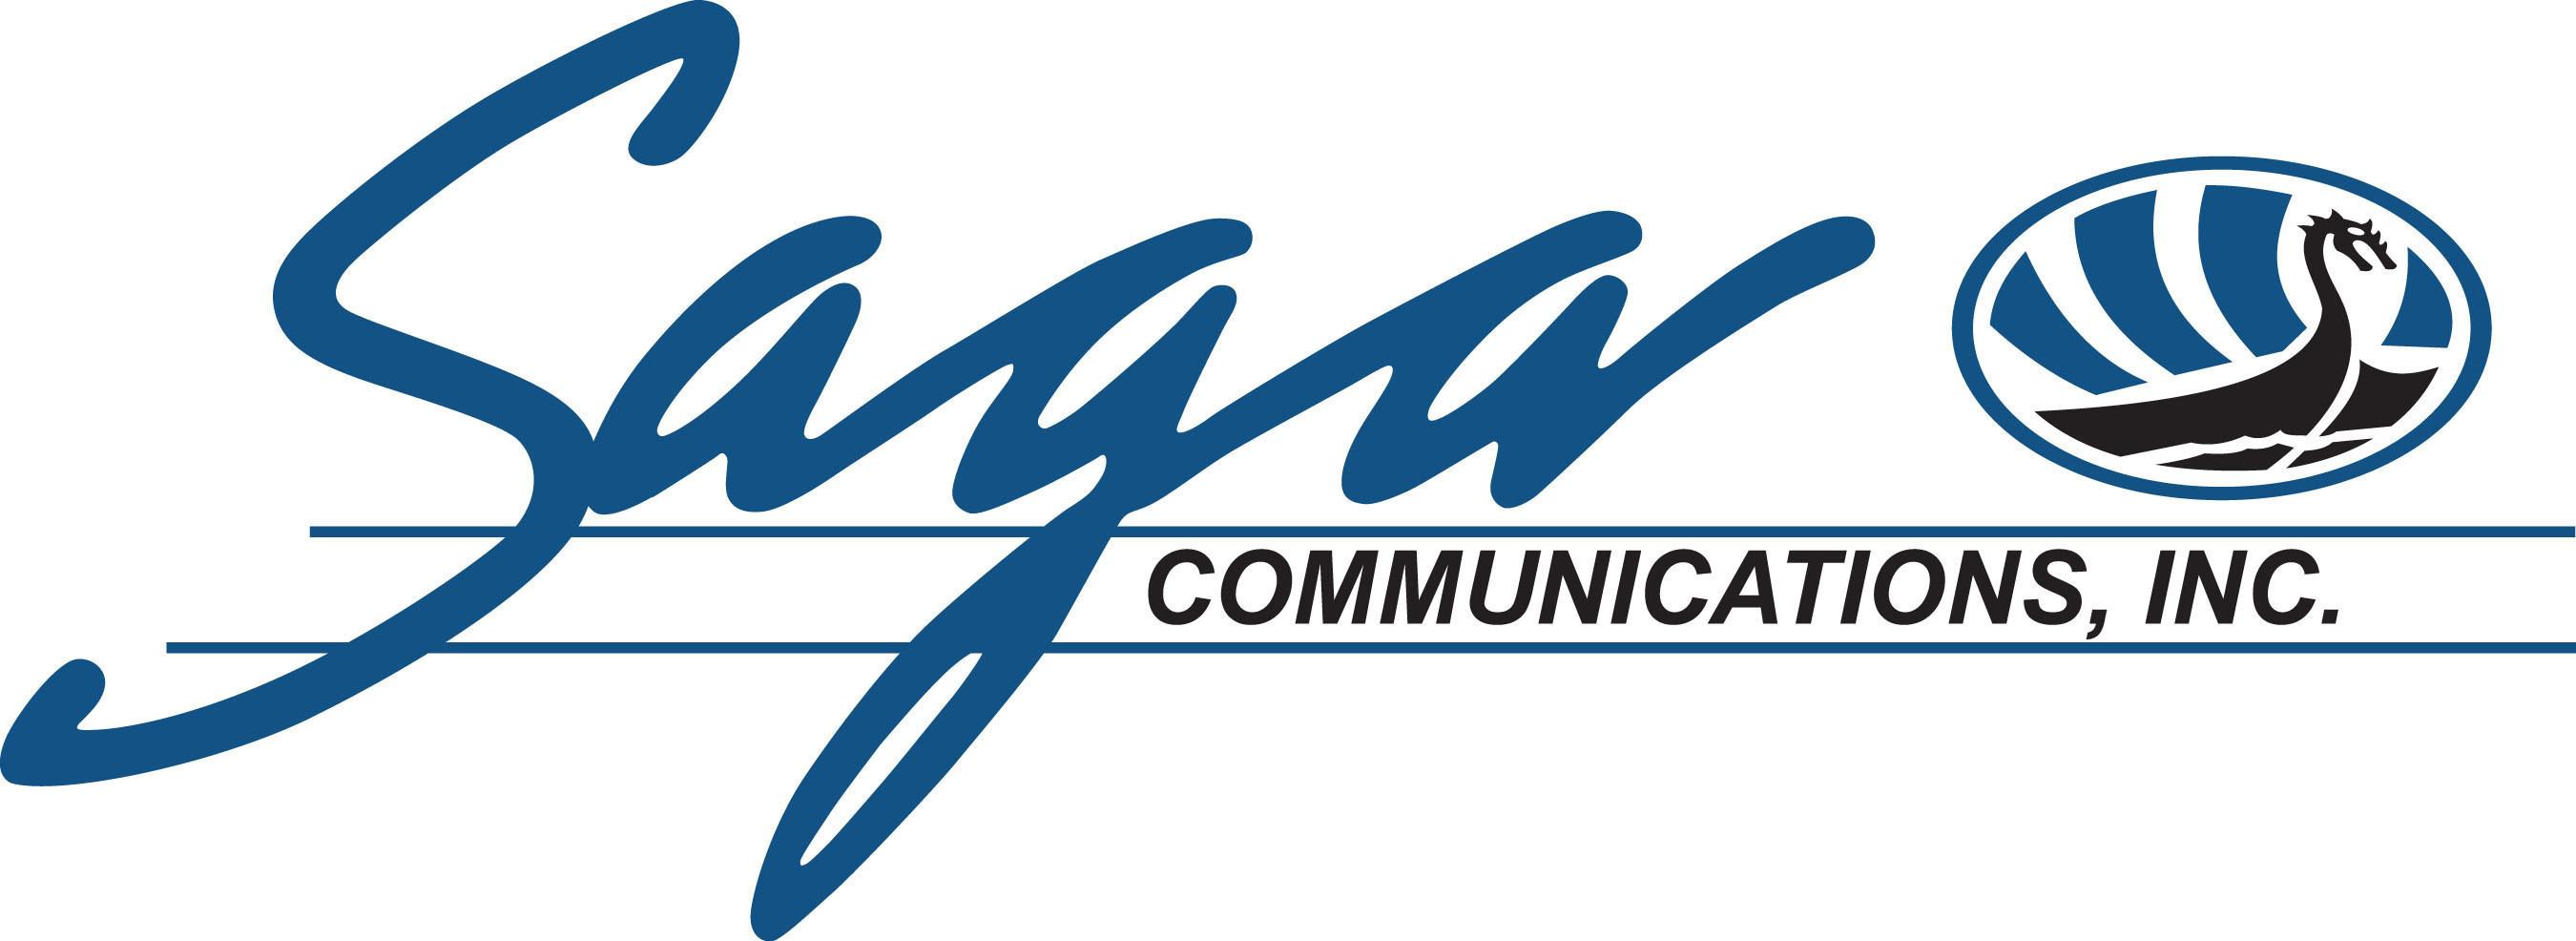 Saga Communications, Inc. Declares Quarterly Cash Dividend of $0.30 per Share